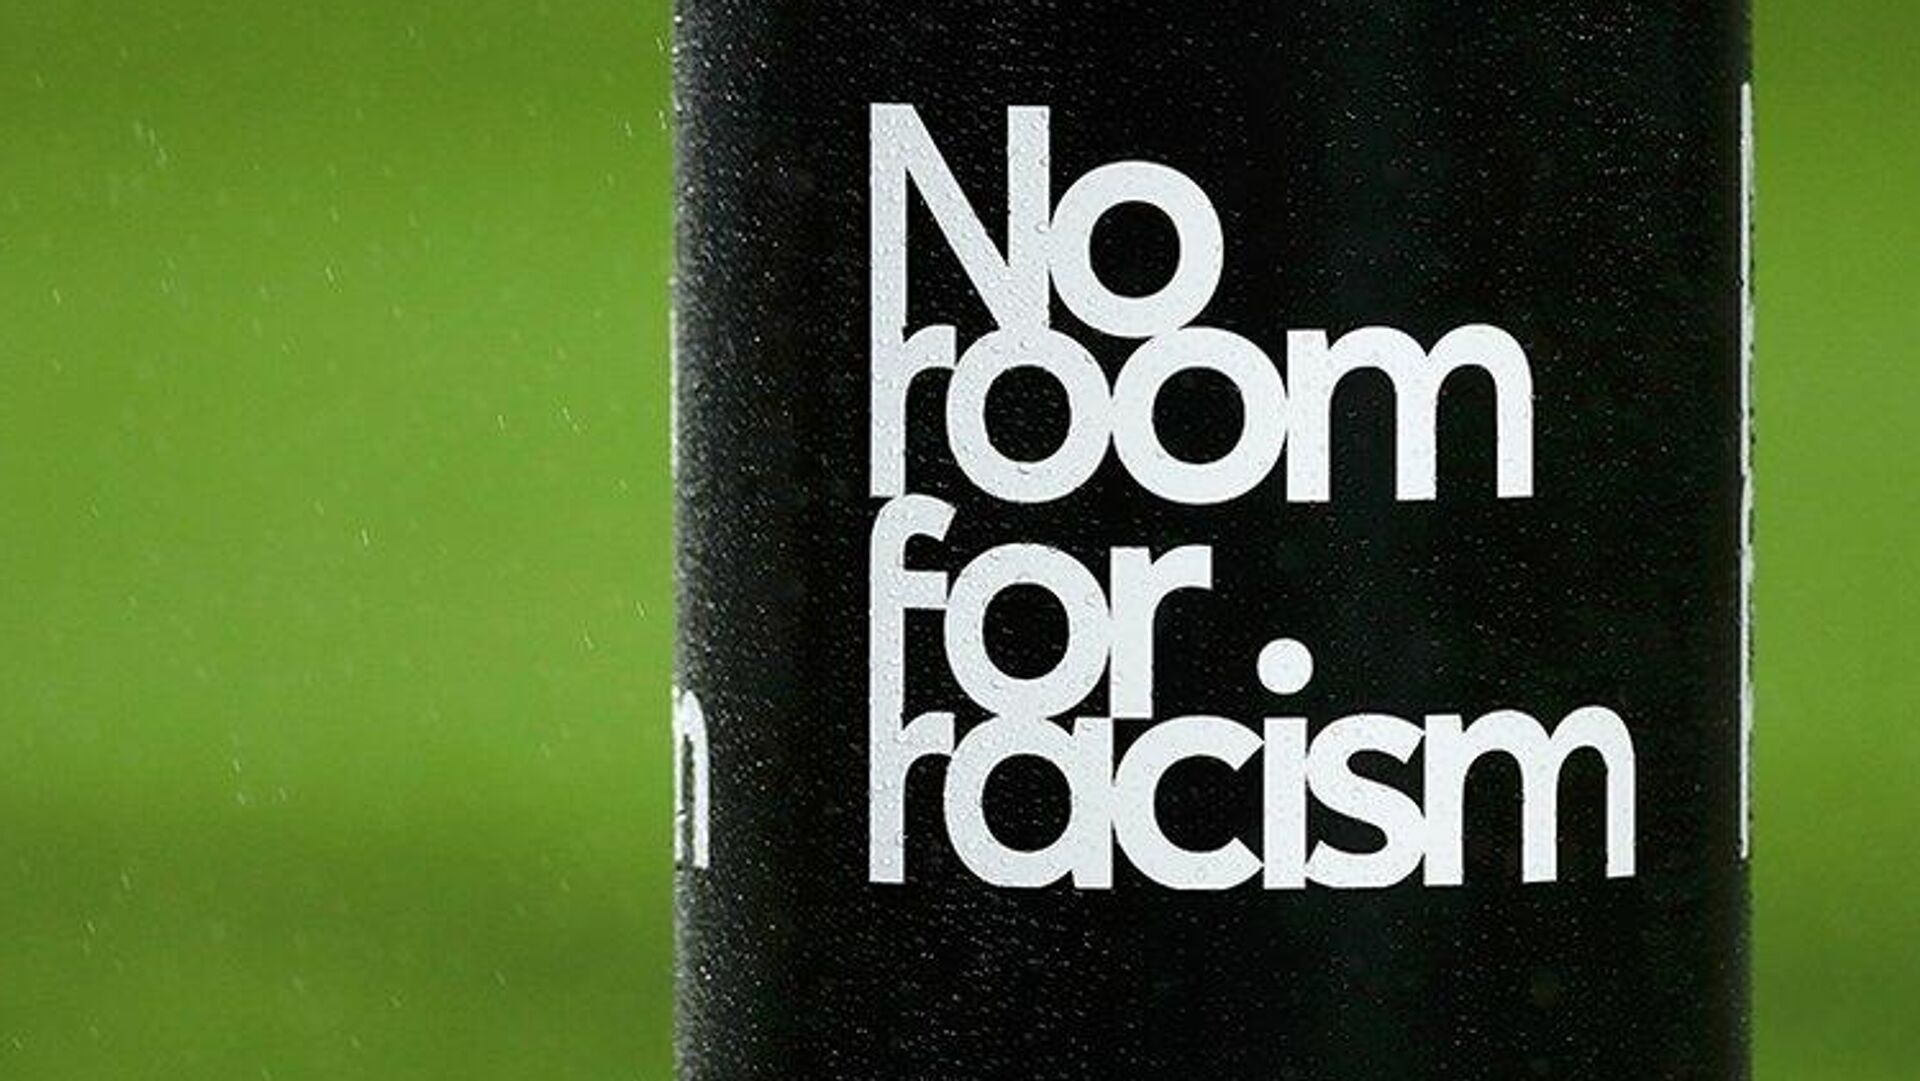 Призыв против расизма на матче АПЛ - РИА Новости, 1920, 10.09.2020